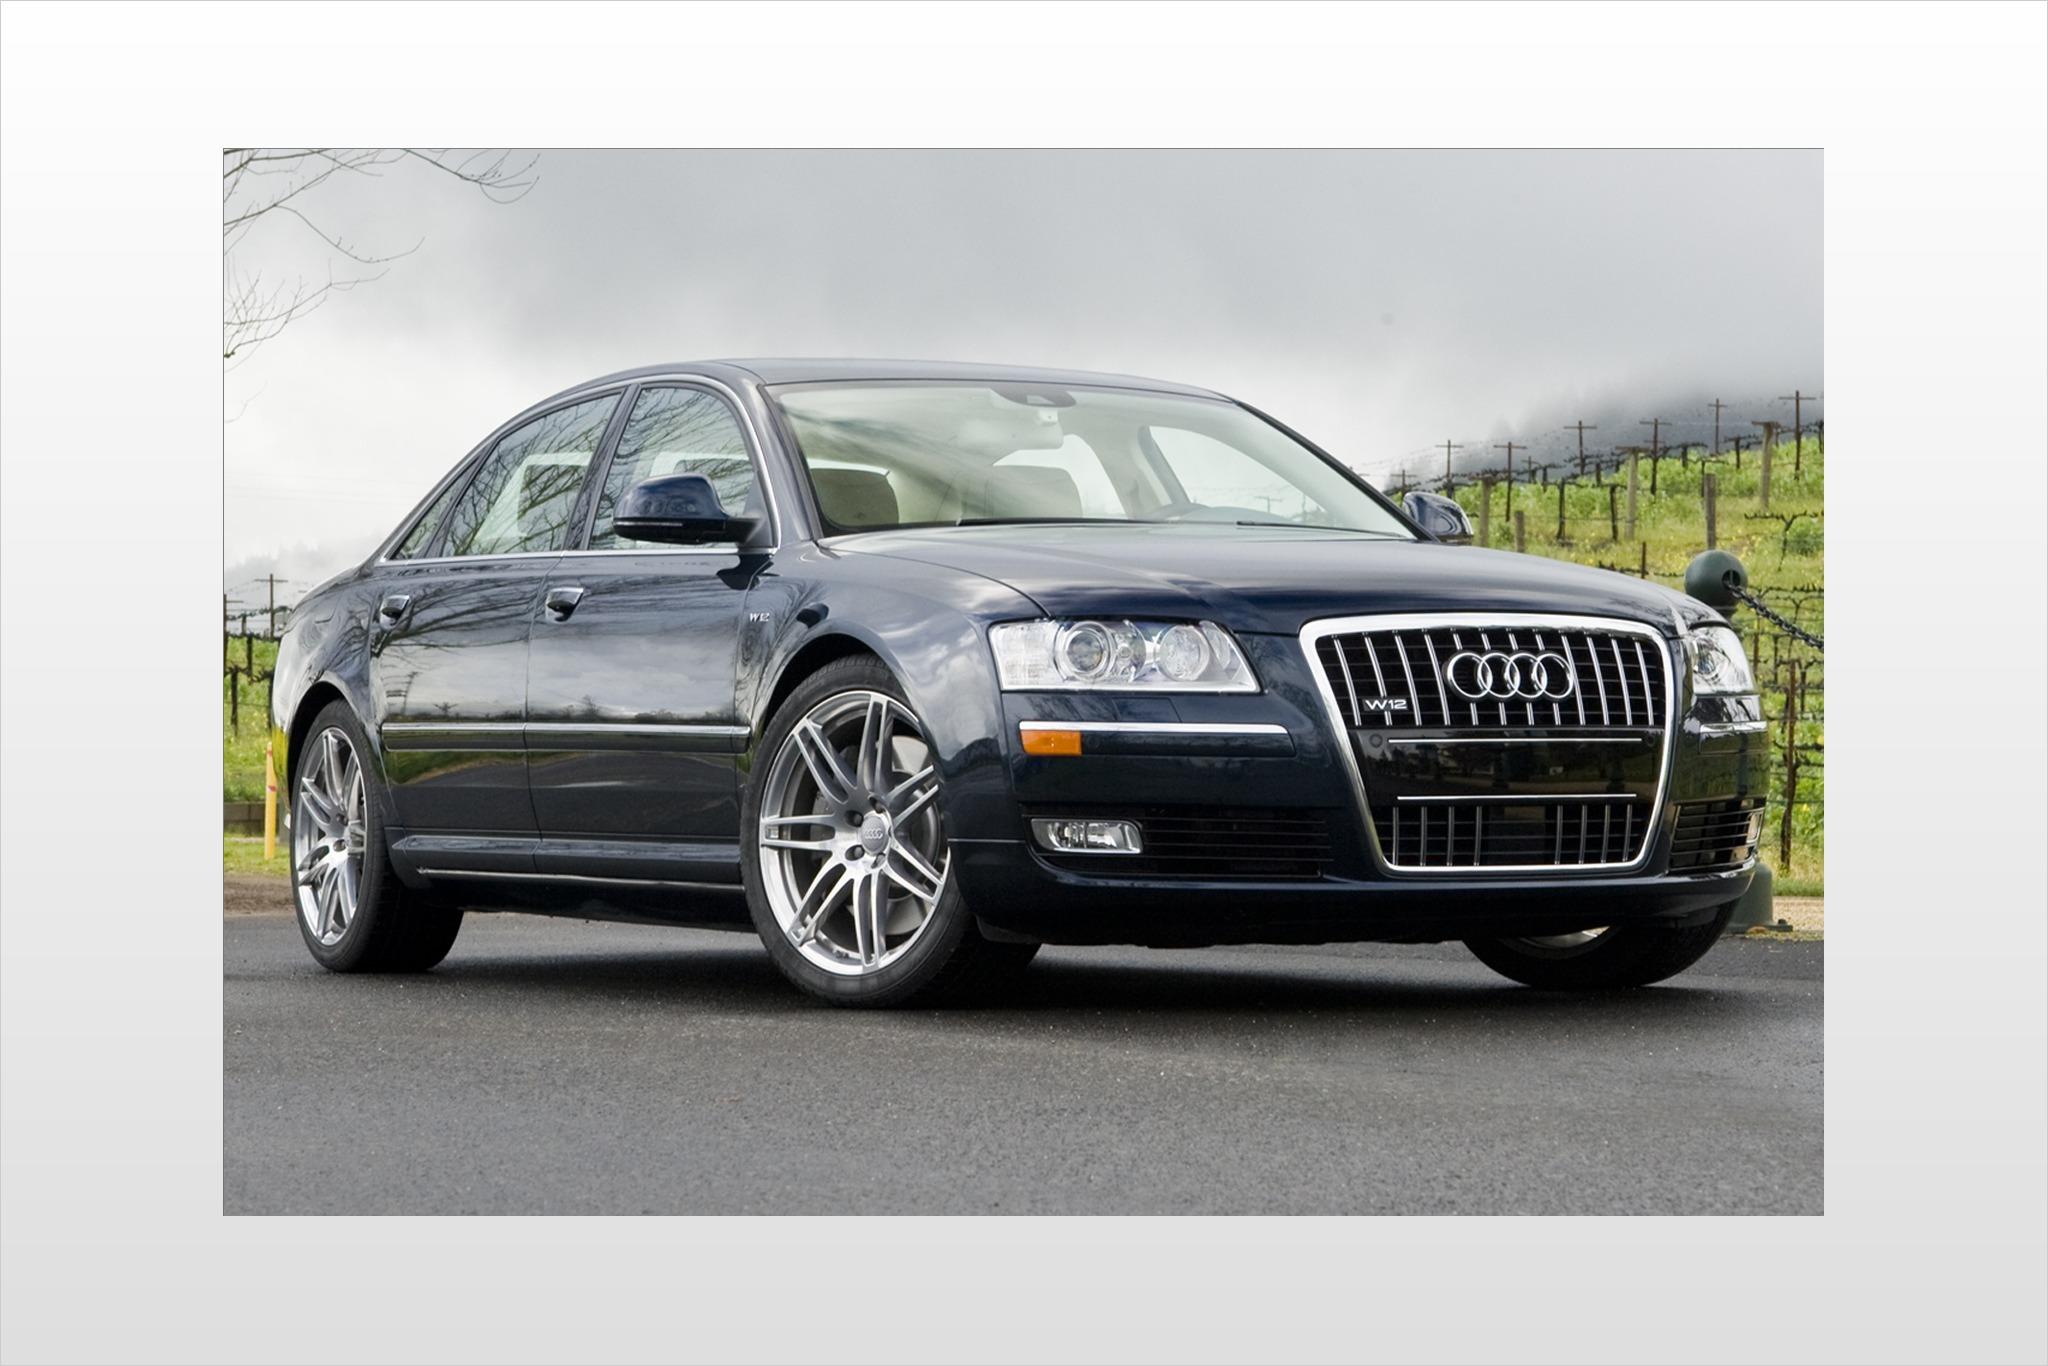 2008 Audi A8 Image 2